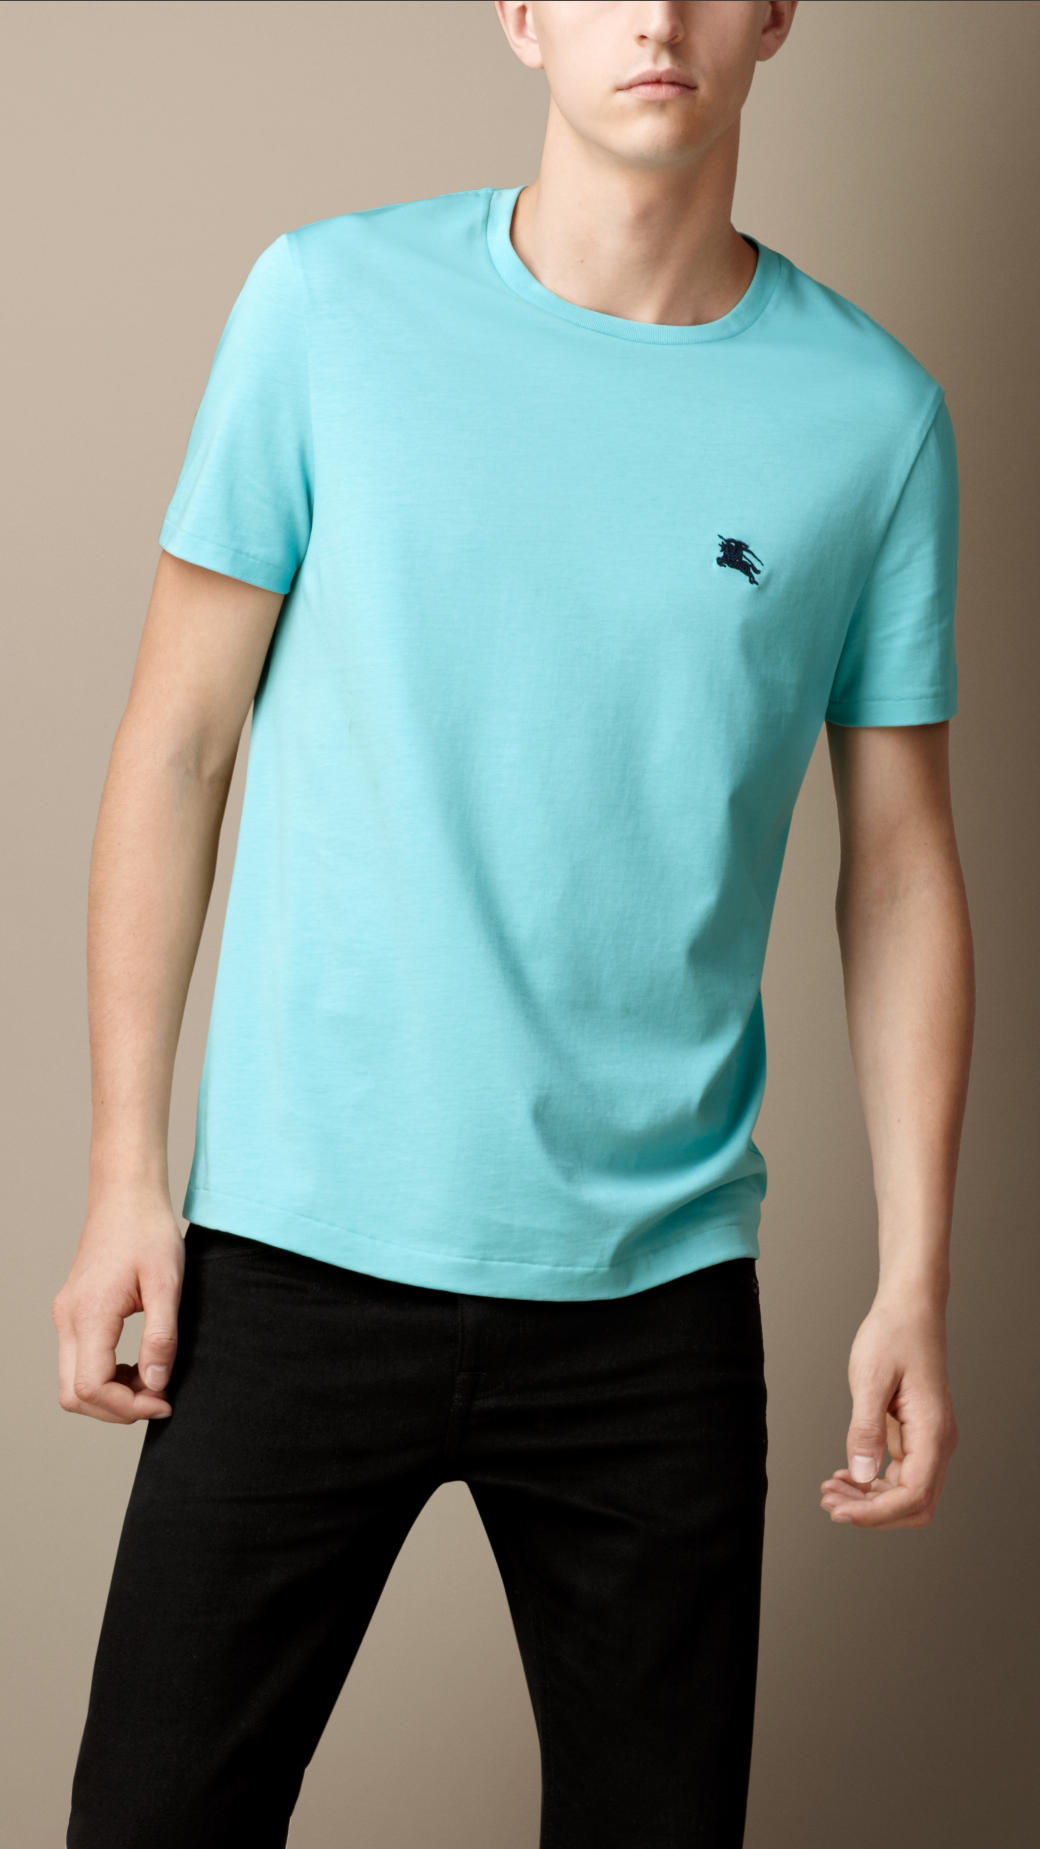 70cbb9081 Burberry Liquid Soft Cotton T-Shirt in Blue for Men - Lyst